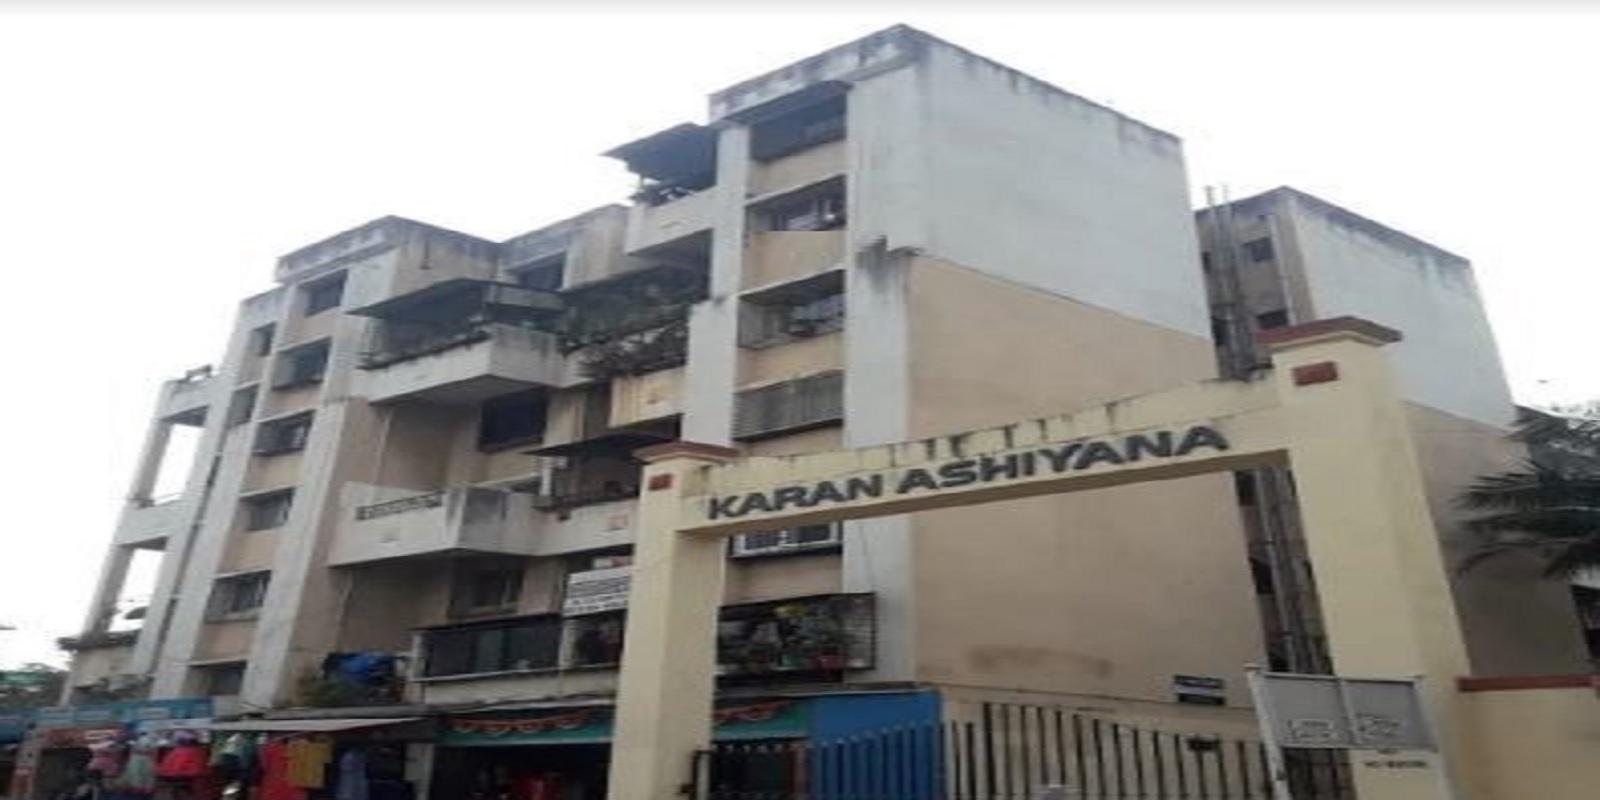 karan ashiyana project project large image1